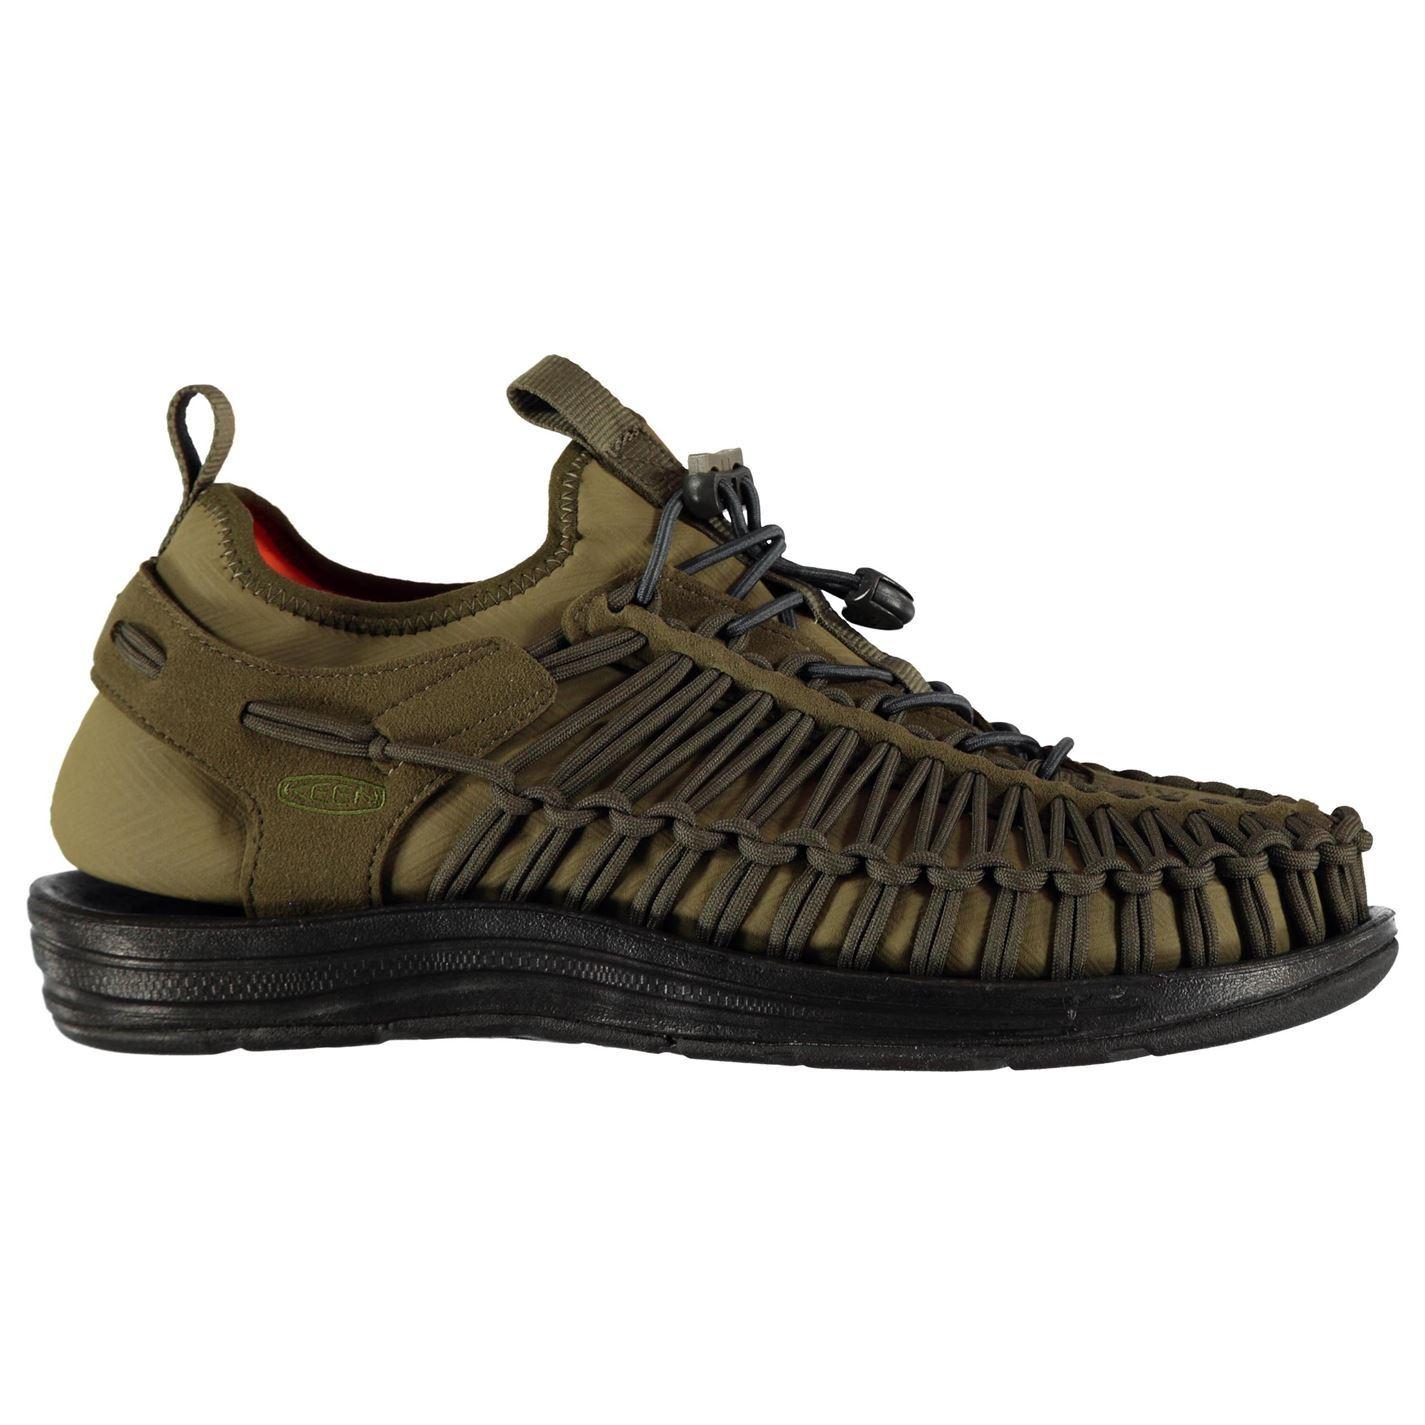 9d9f8c07ff98 Image is loading Mens-Keen-Uneek-HT-Shoes-Sports-Sandals-Mesh-